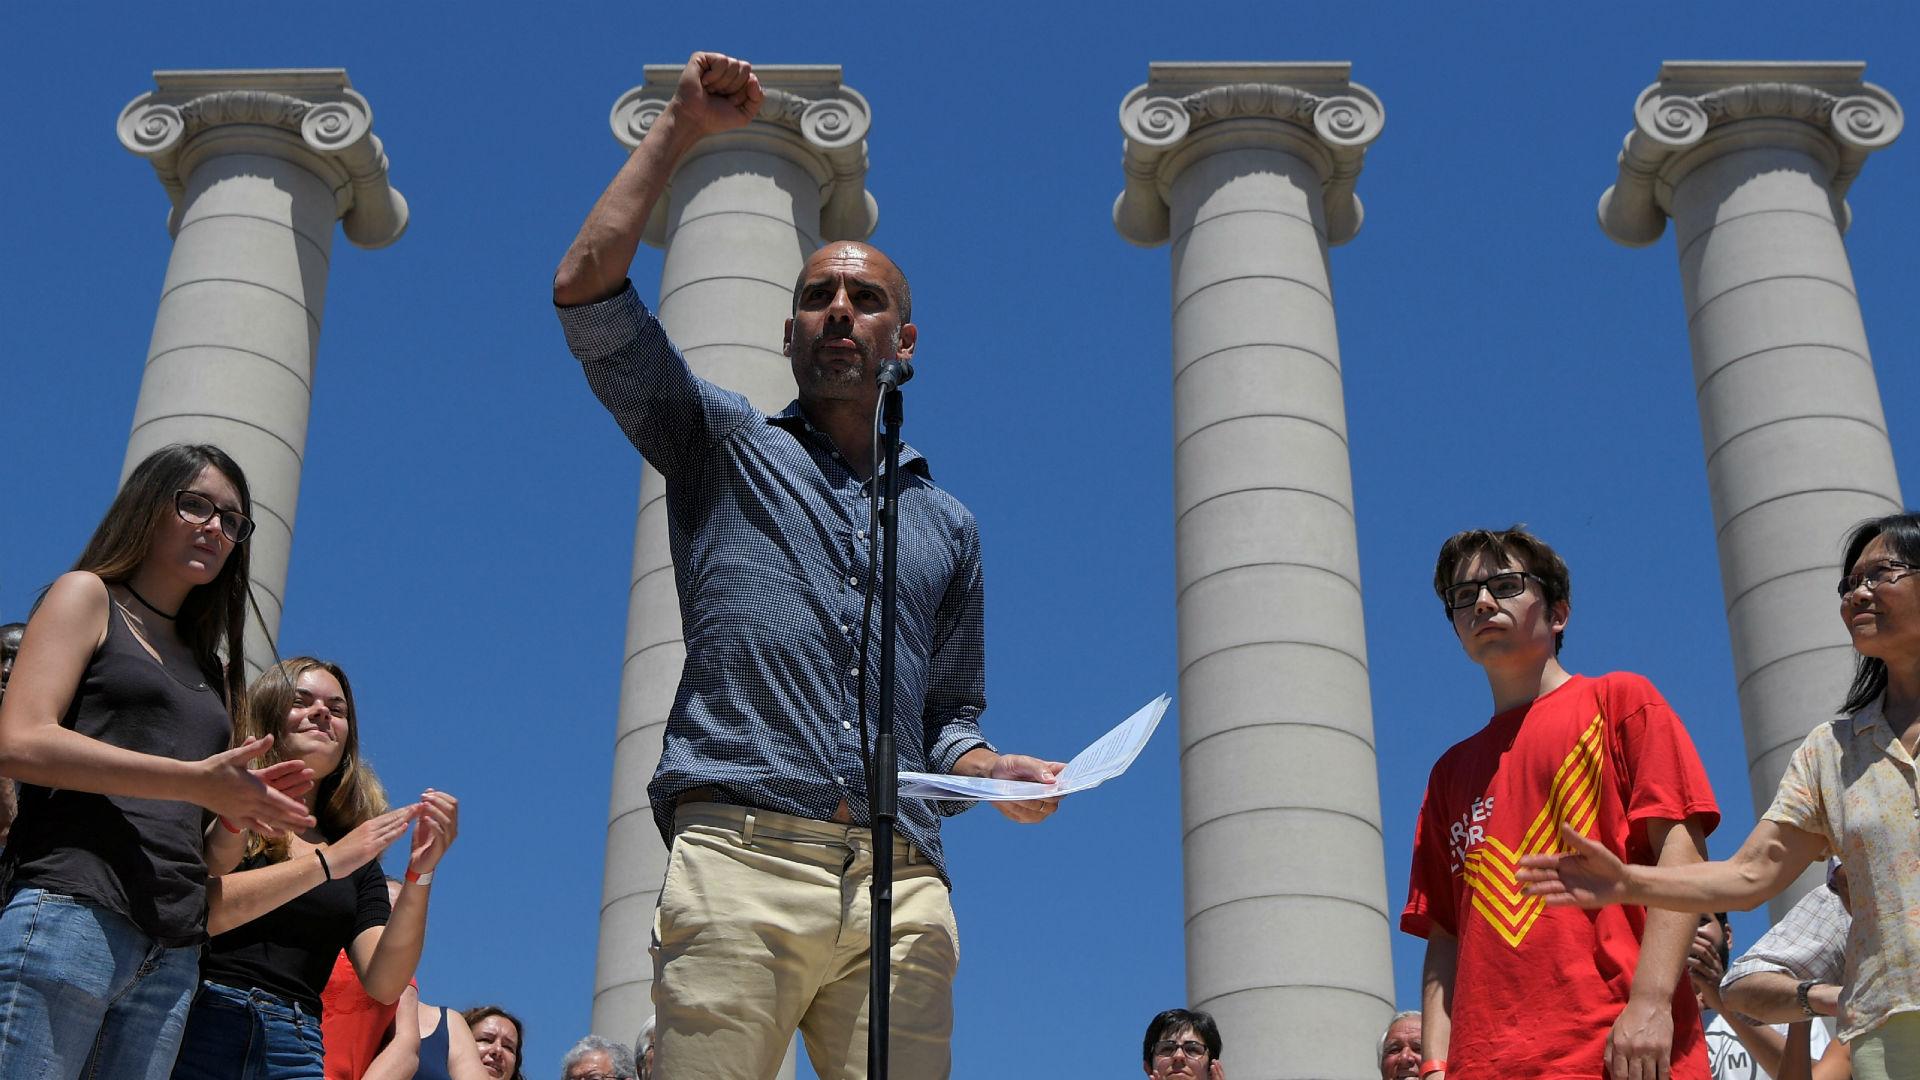 España: Rey Felipe VI considera